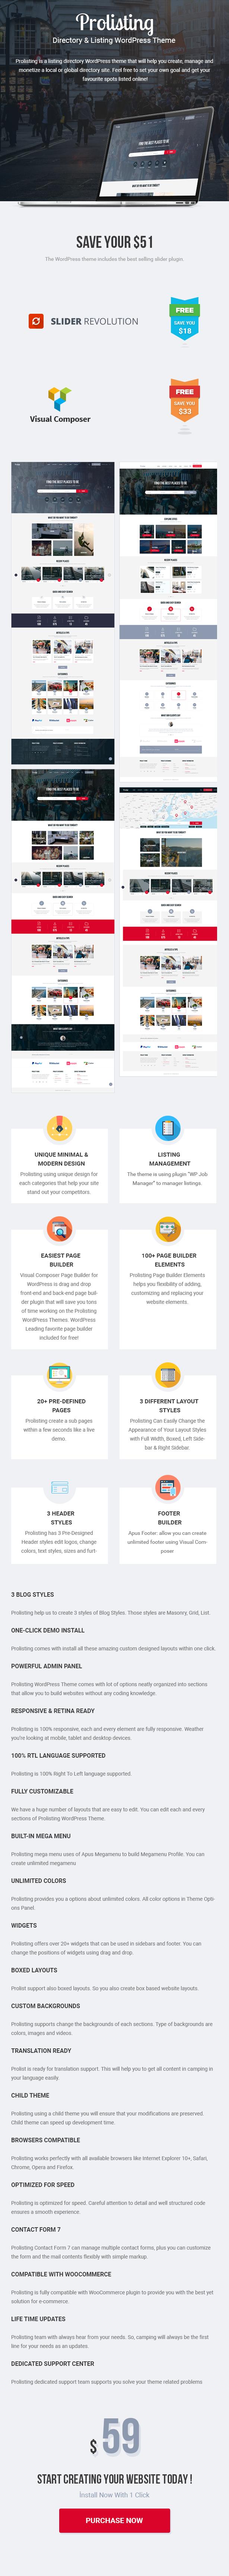 Prolist - Directory Listing WordPress Theme - 1